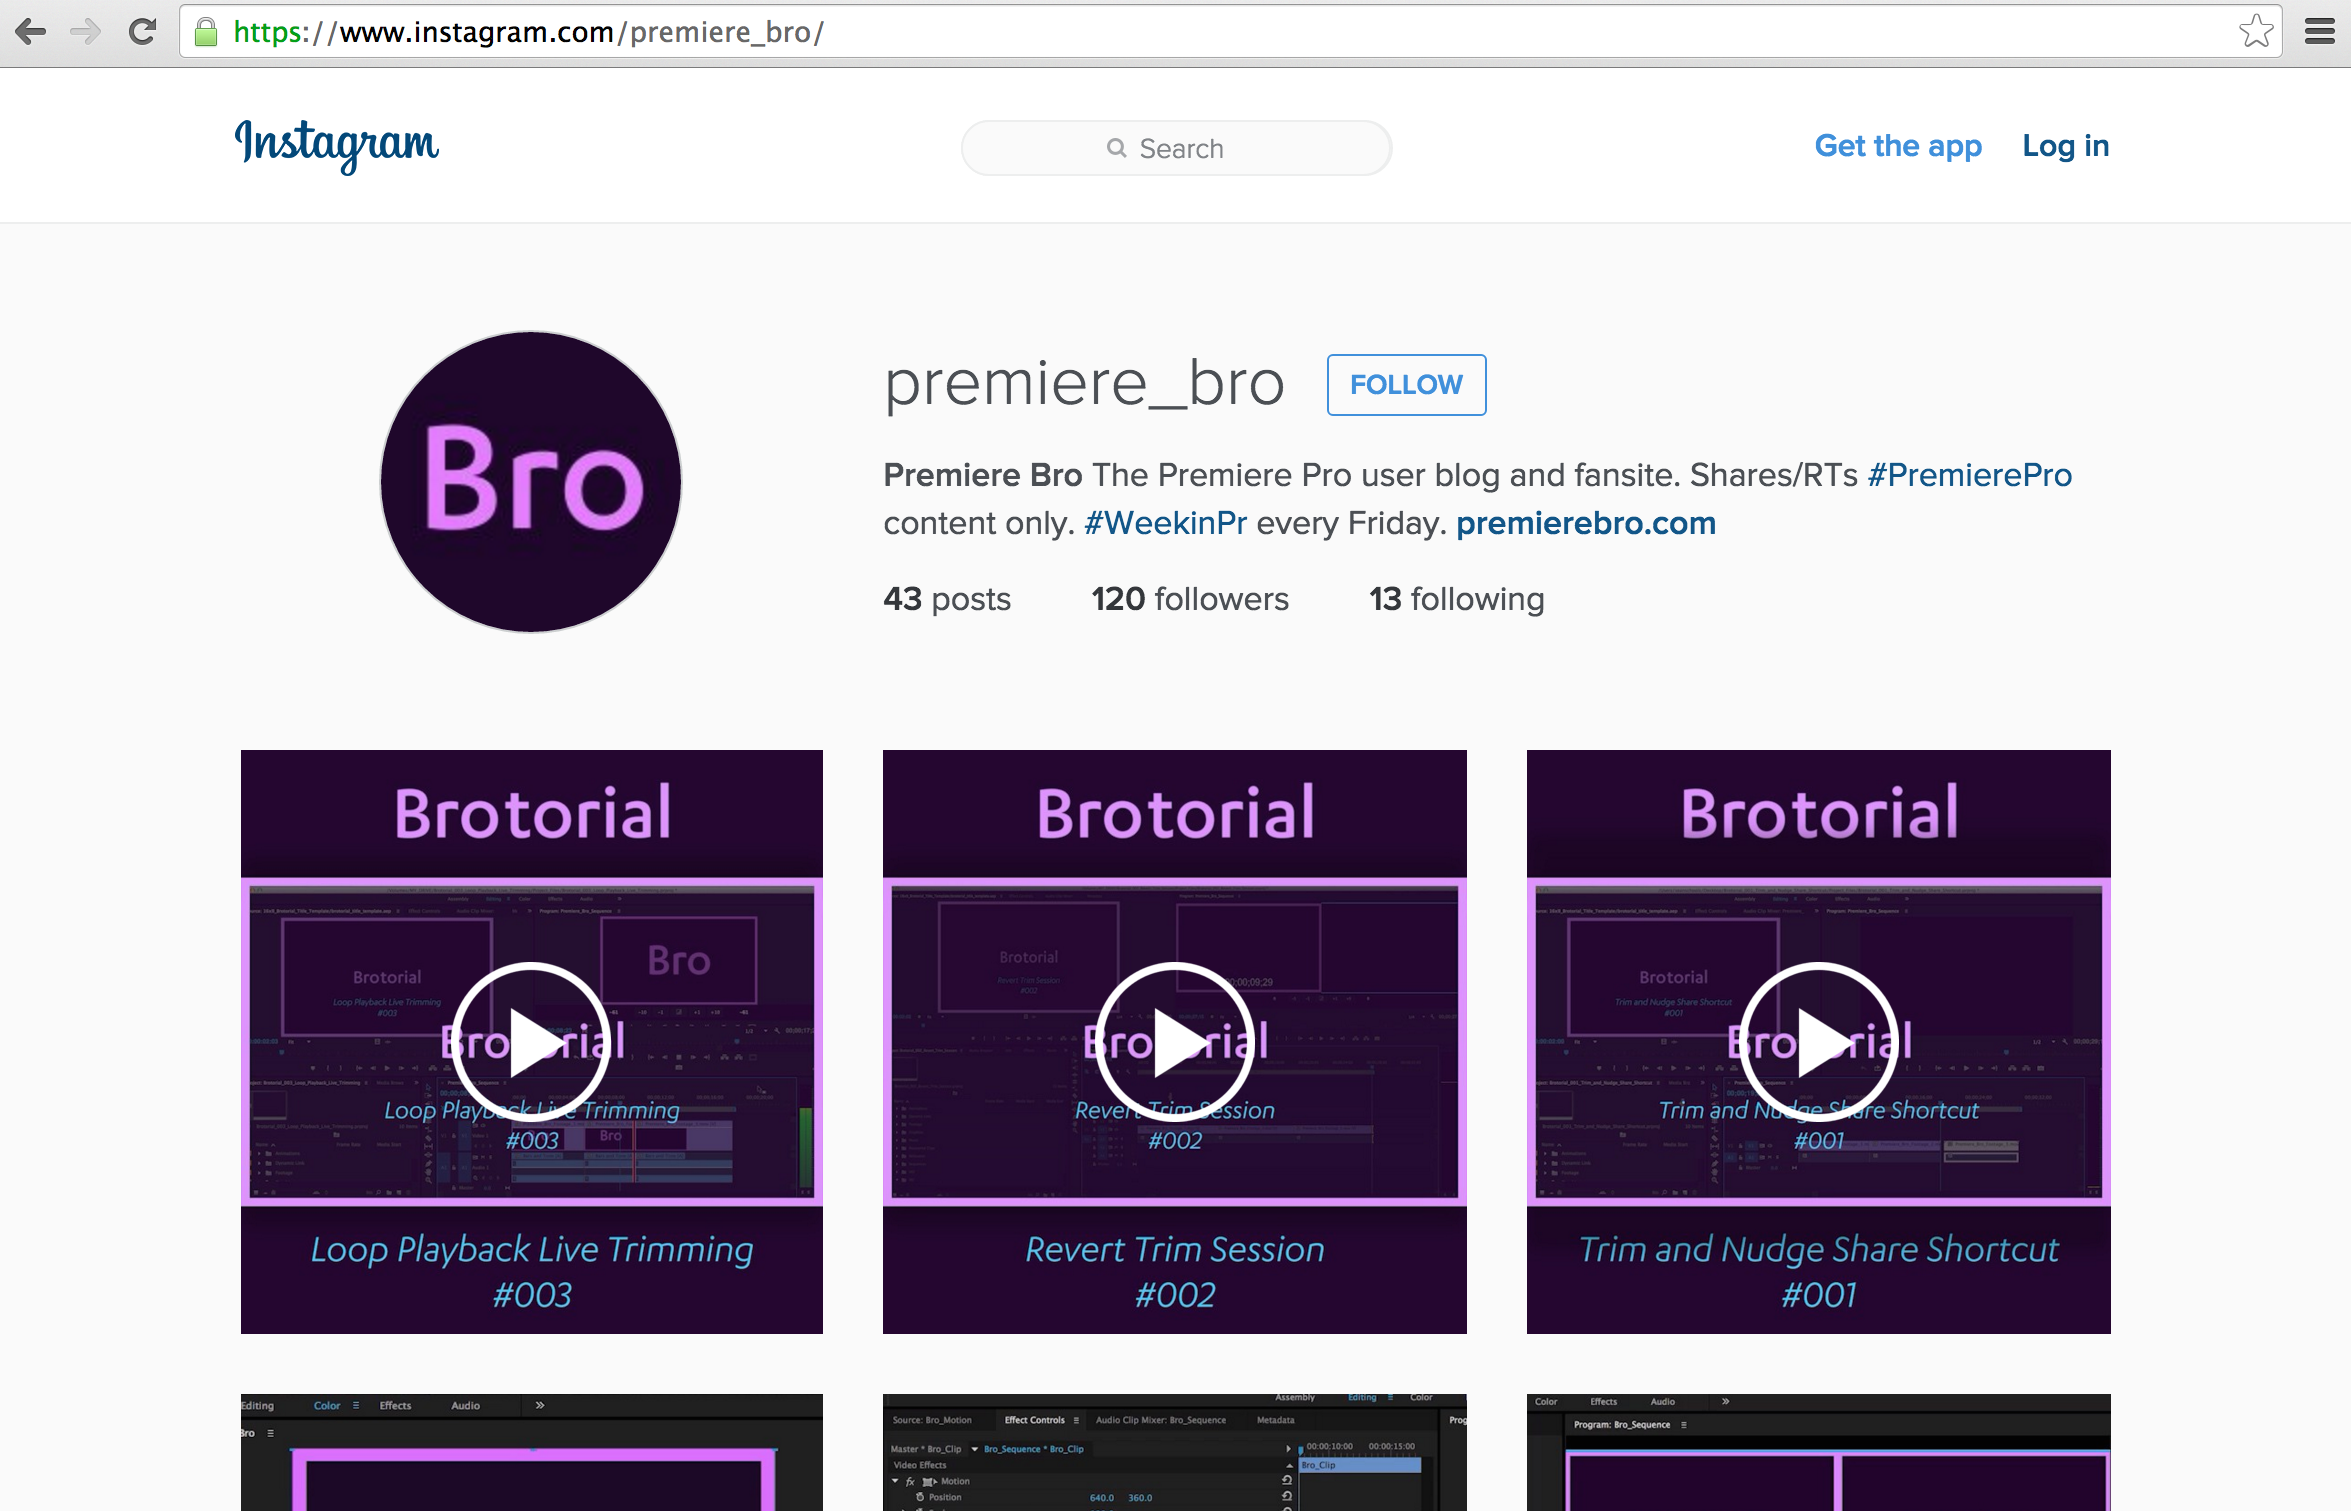 Premiere Bro Instagram